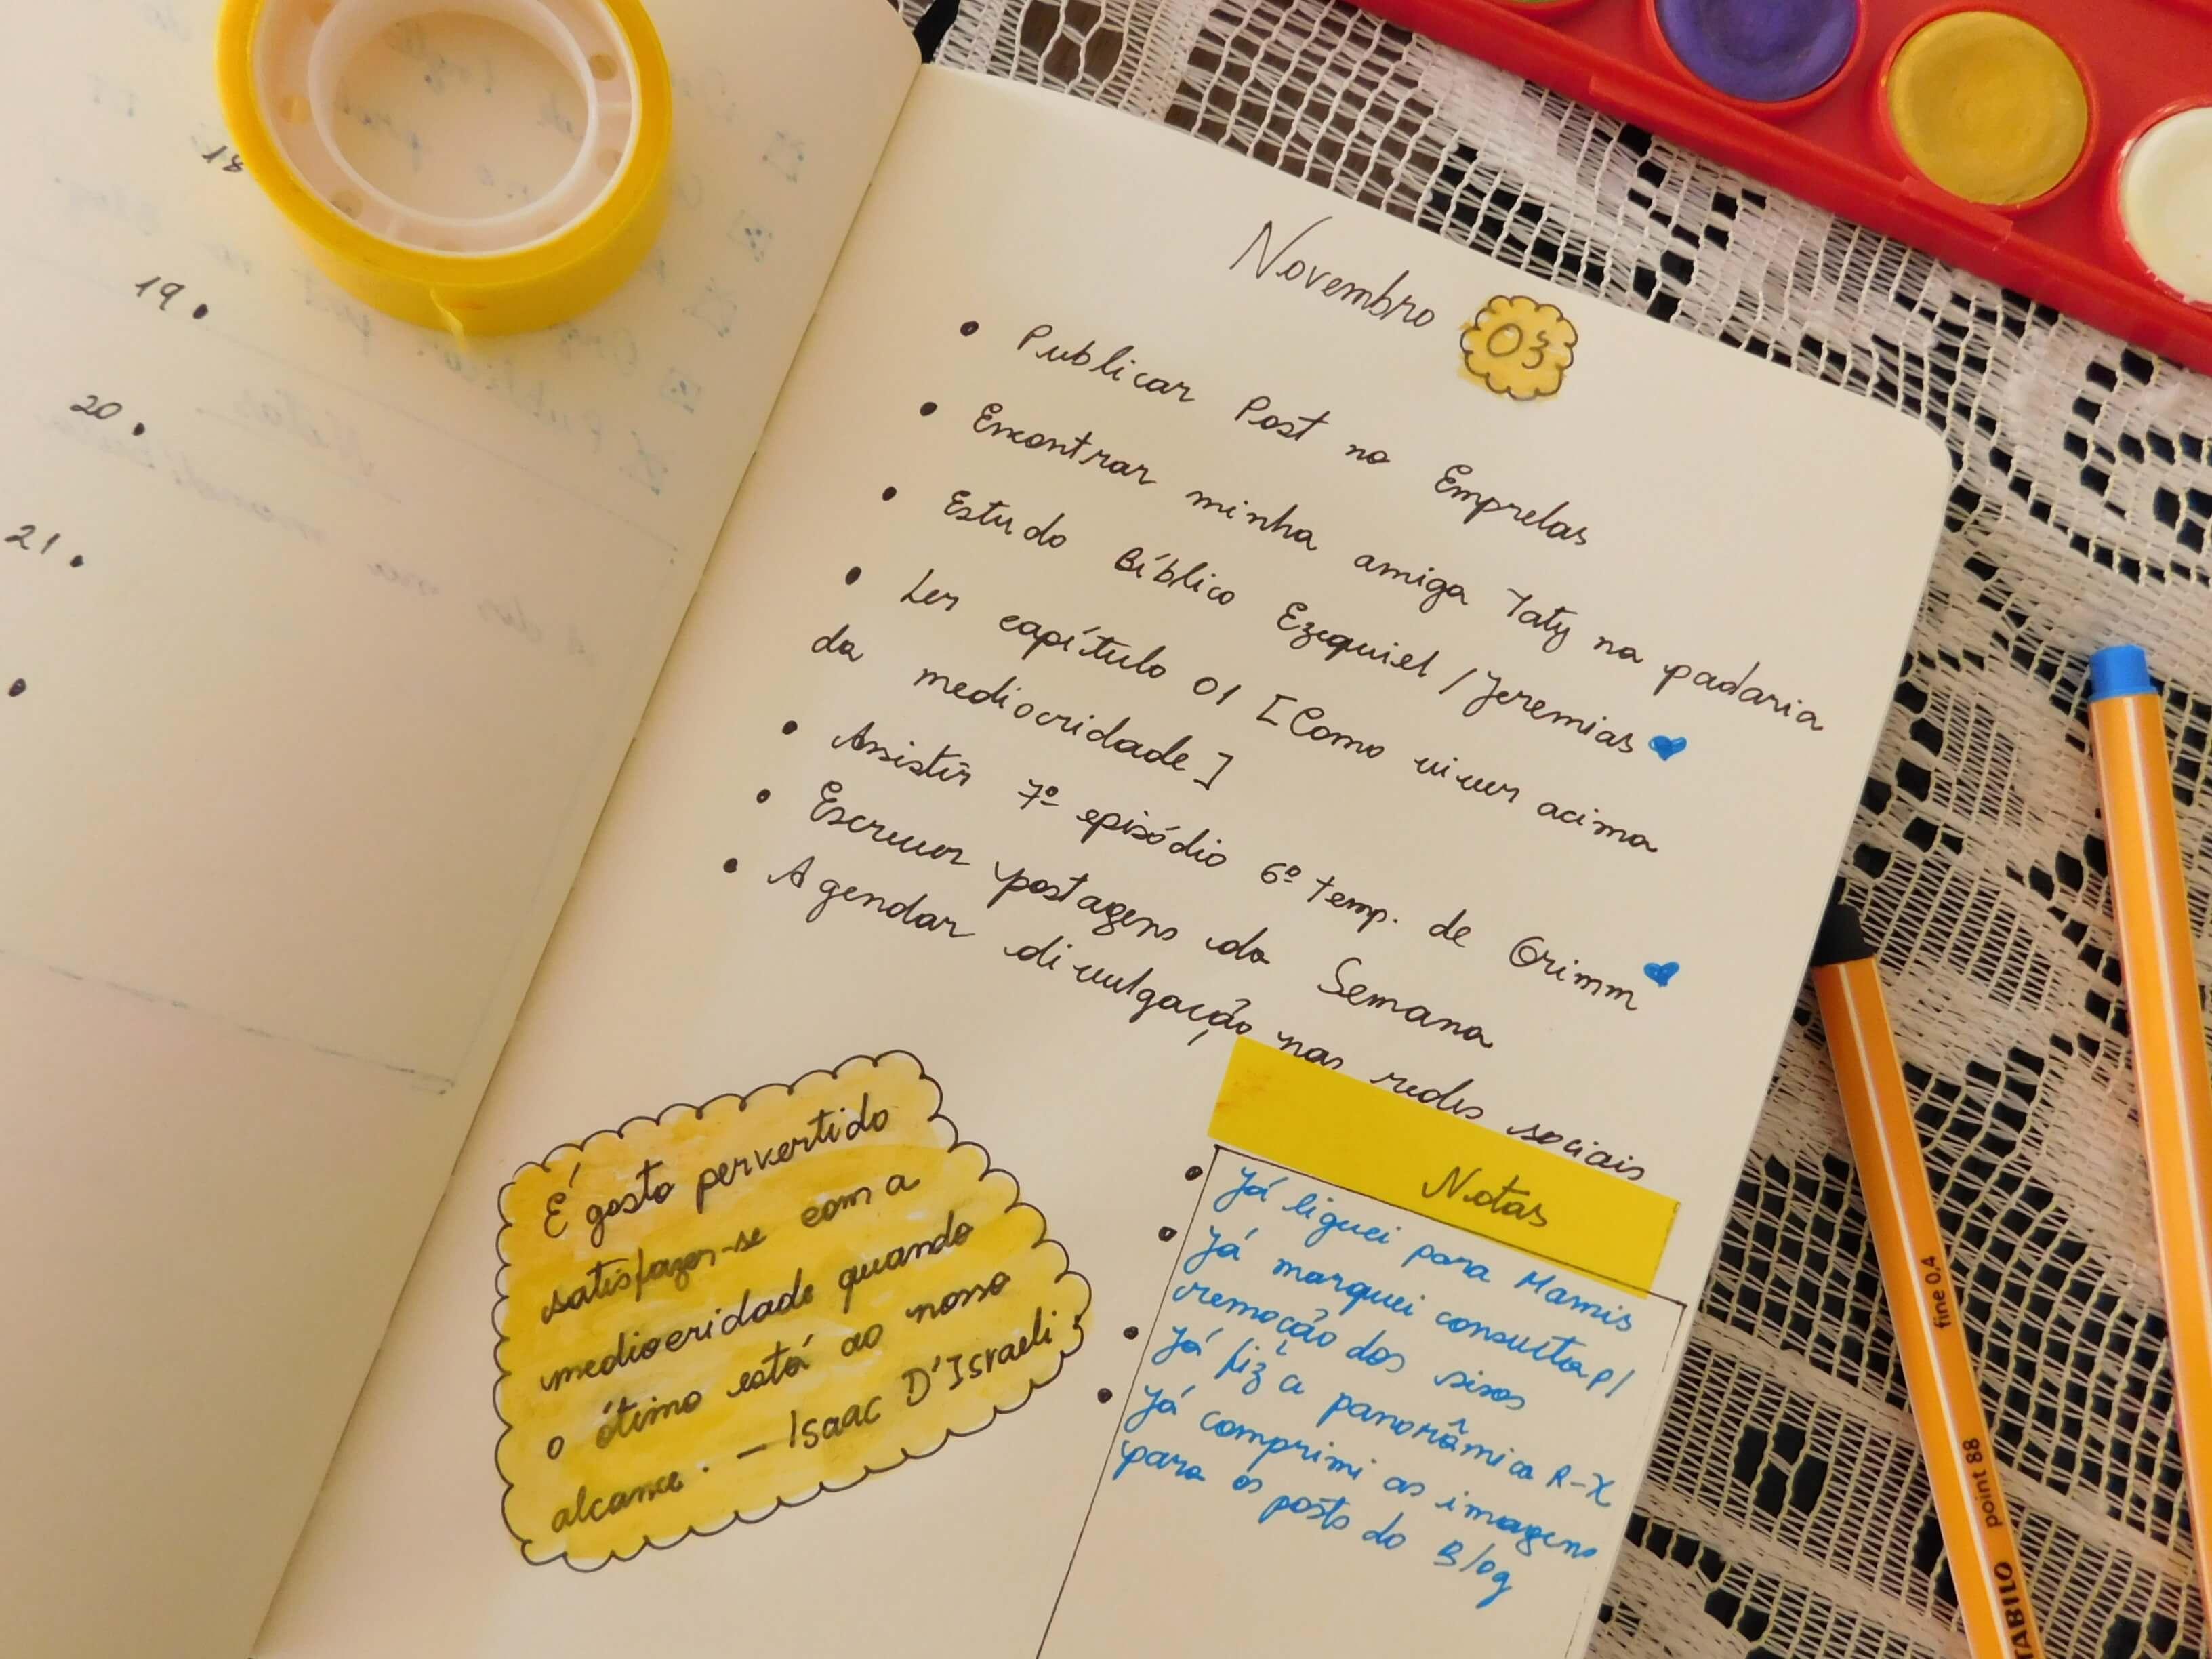 página-diária-bullet-journal-blogdanieleleite